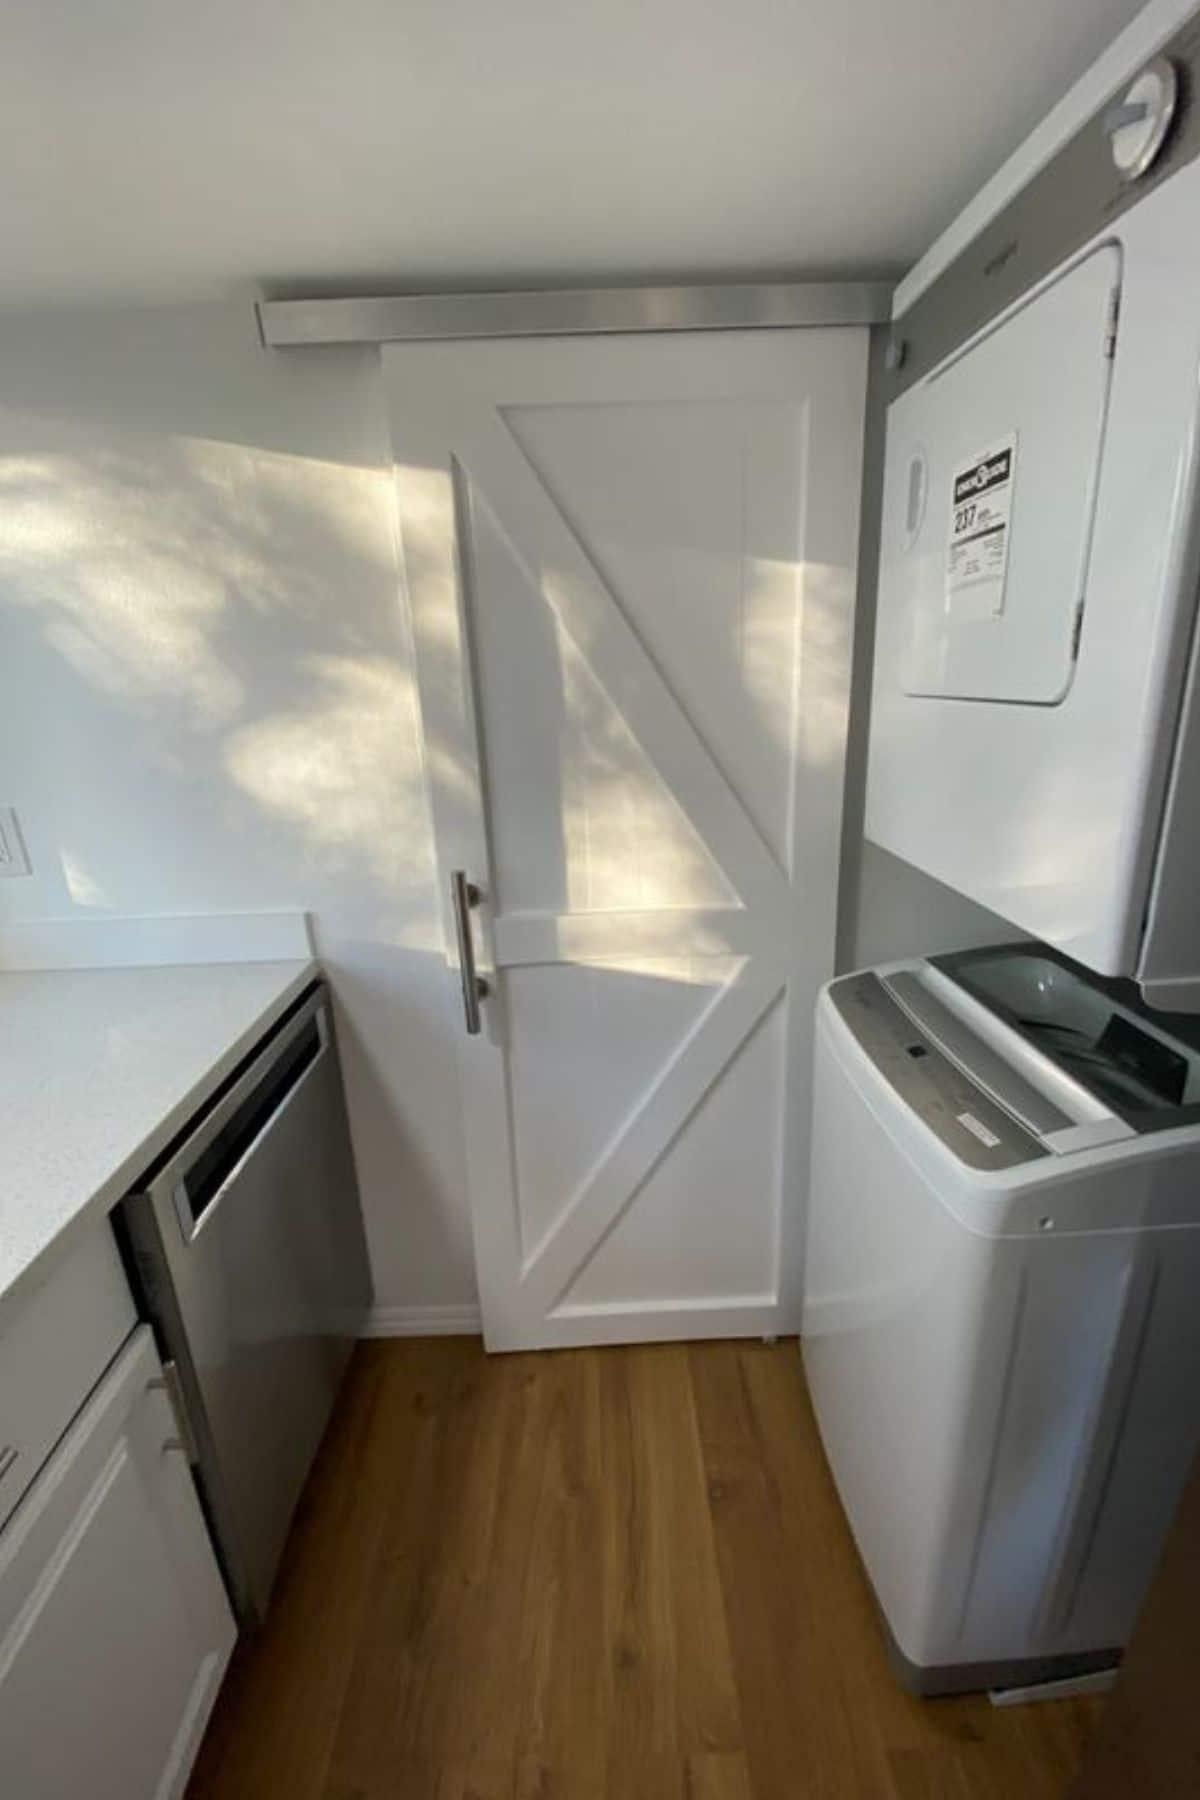 barn door to bathroom next to laundry setup on right